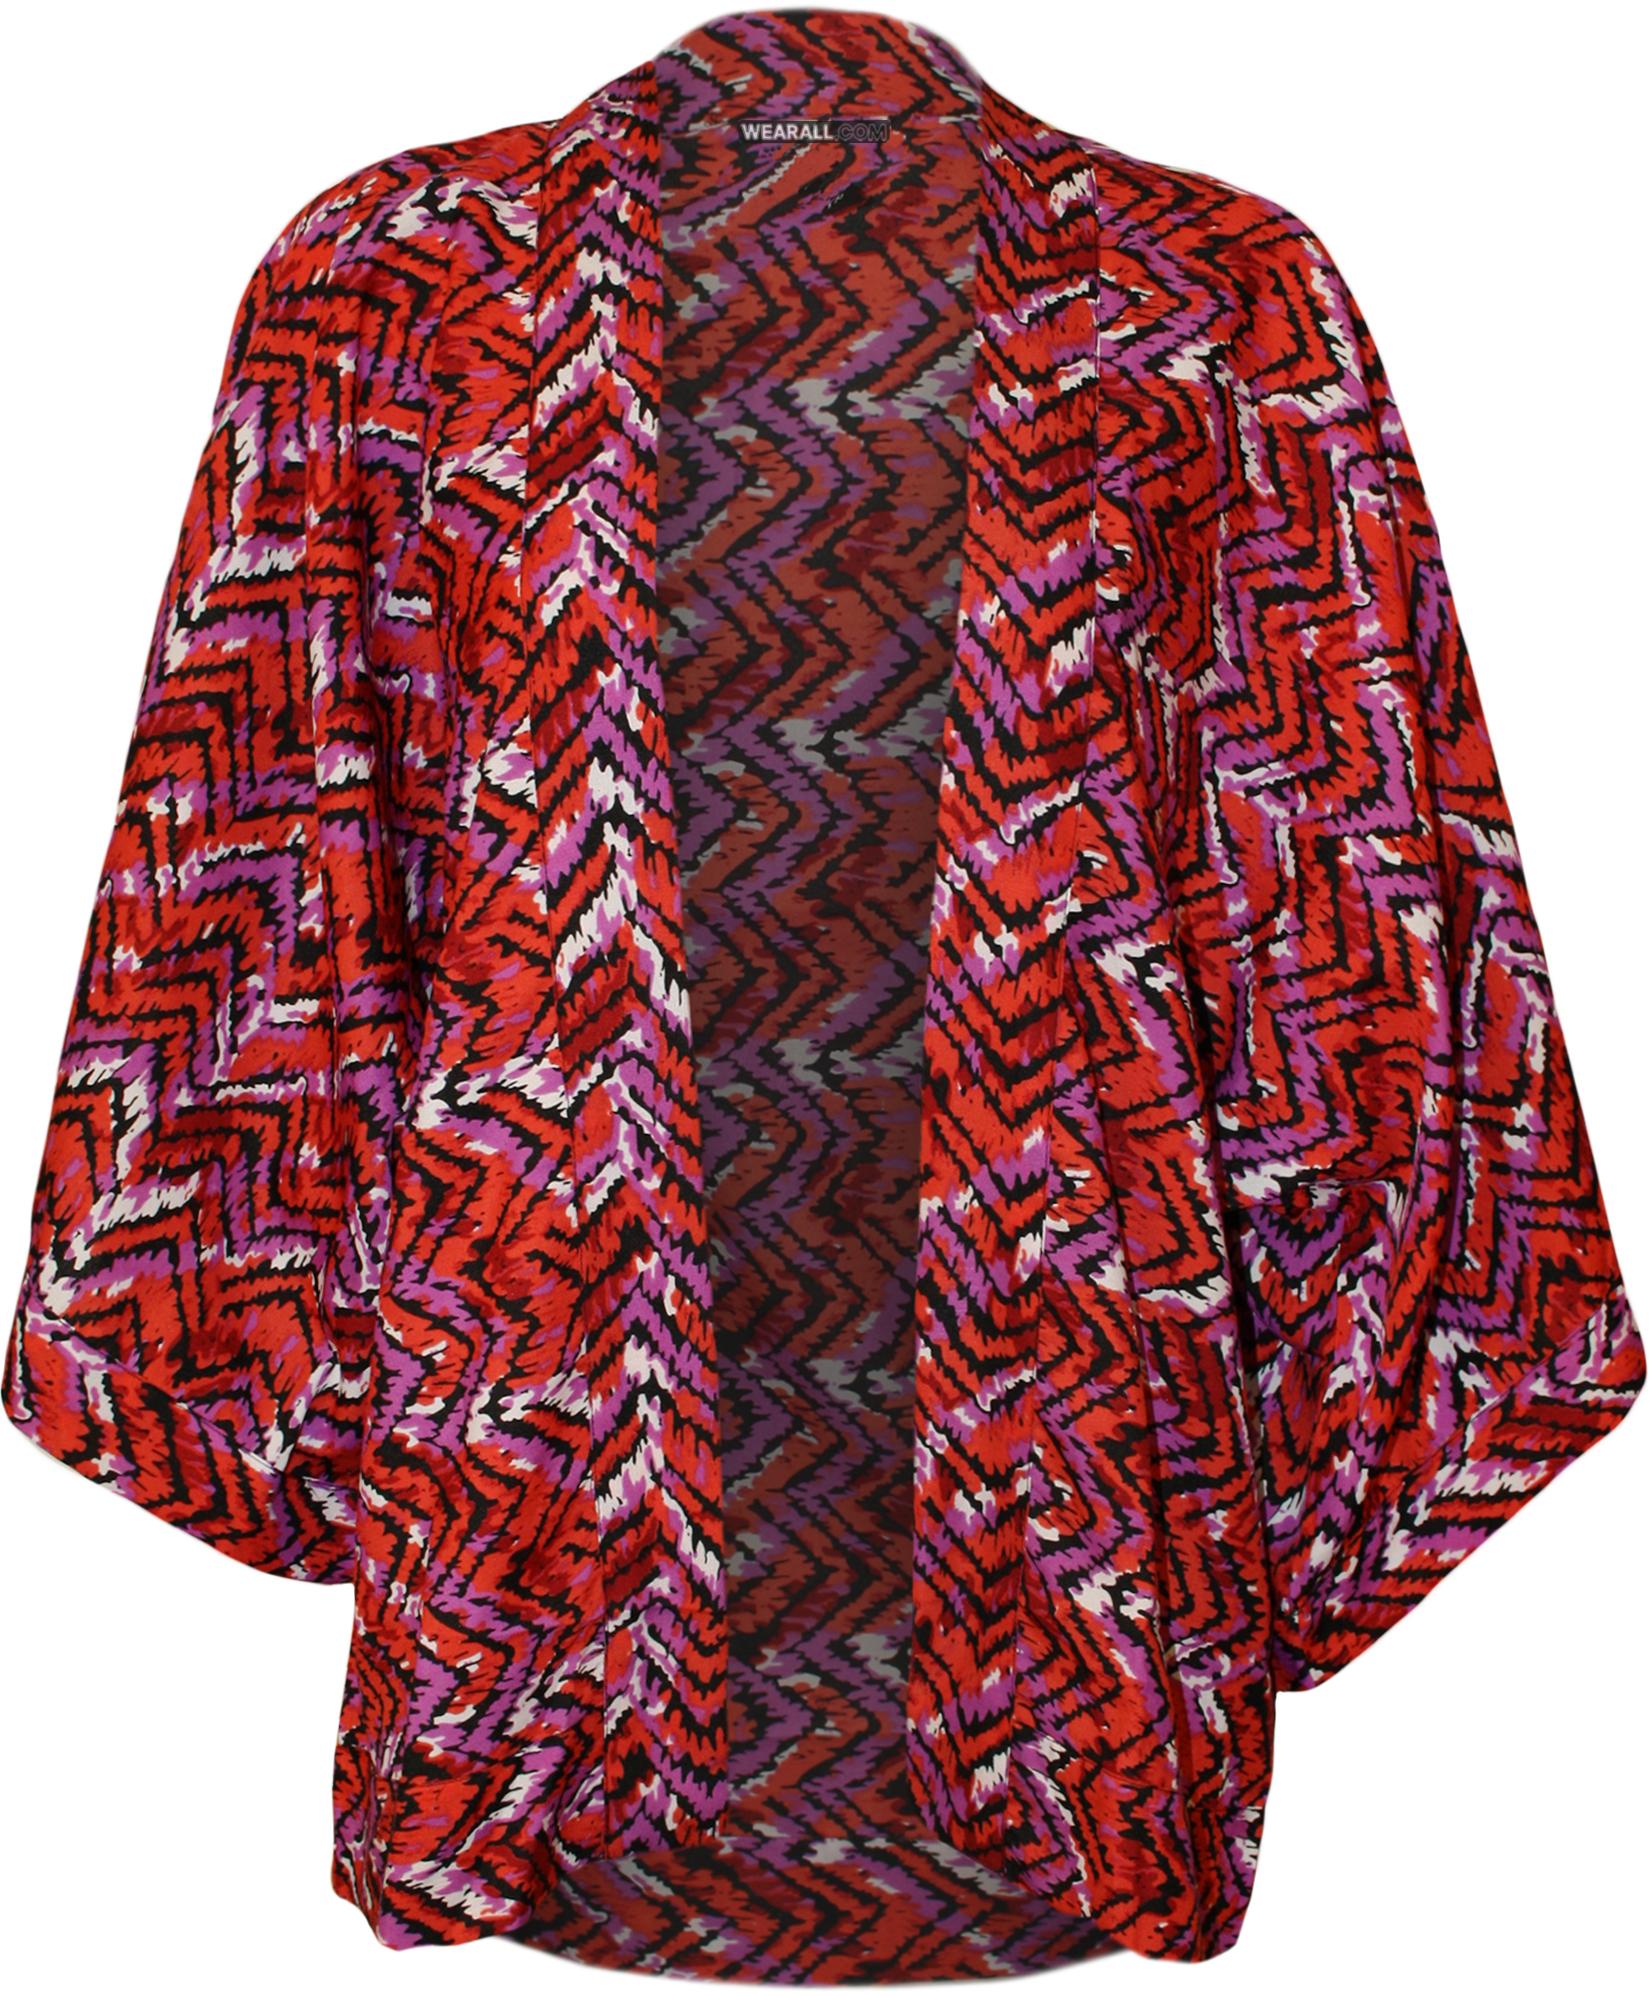 damen strickjacke blumenmuster 3 4 rmel kimono offen. Black Bedroom Furniture Sets. Home Design Ideas